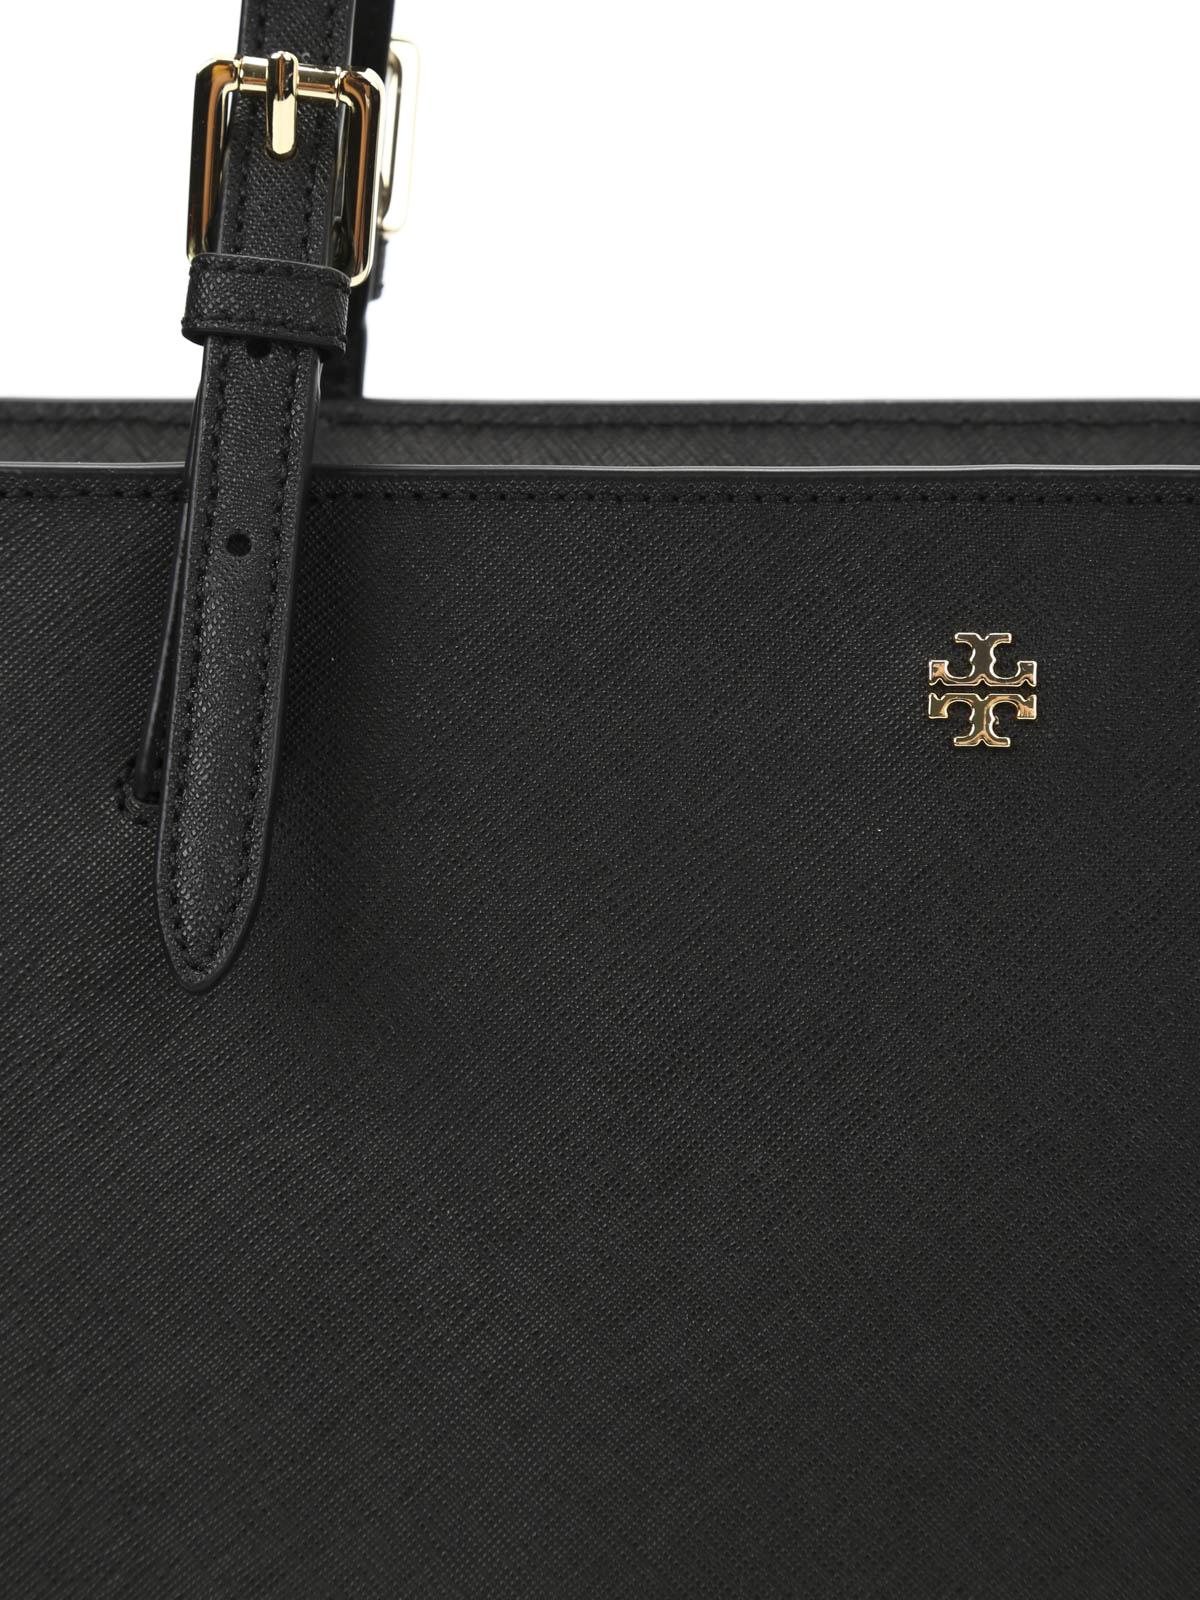 Tory Burch York Small Saffiano Tote Bag Luggage Baik Buckle Black Totes Bags 3115978115 001